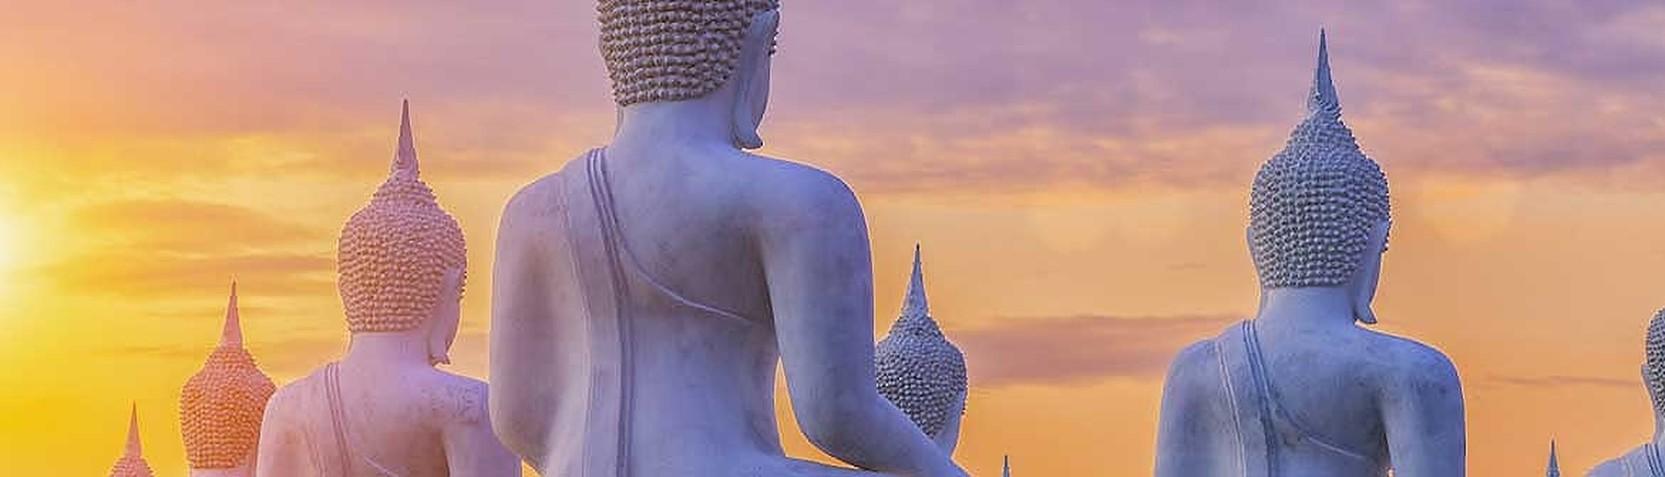 Fotografie - Religion & Spiritualität